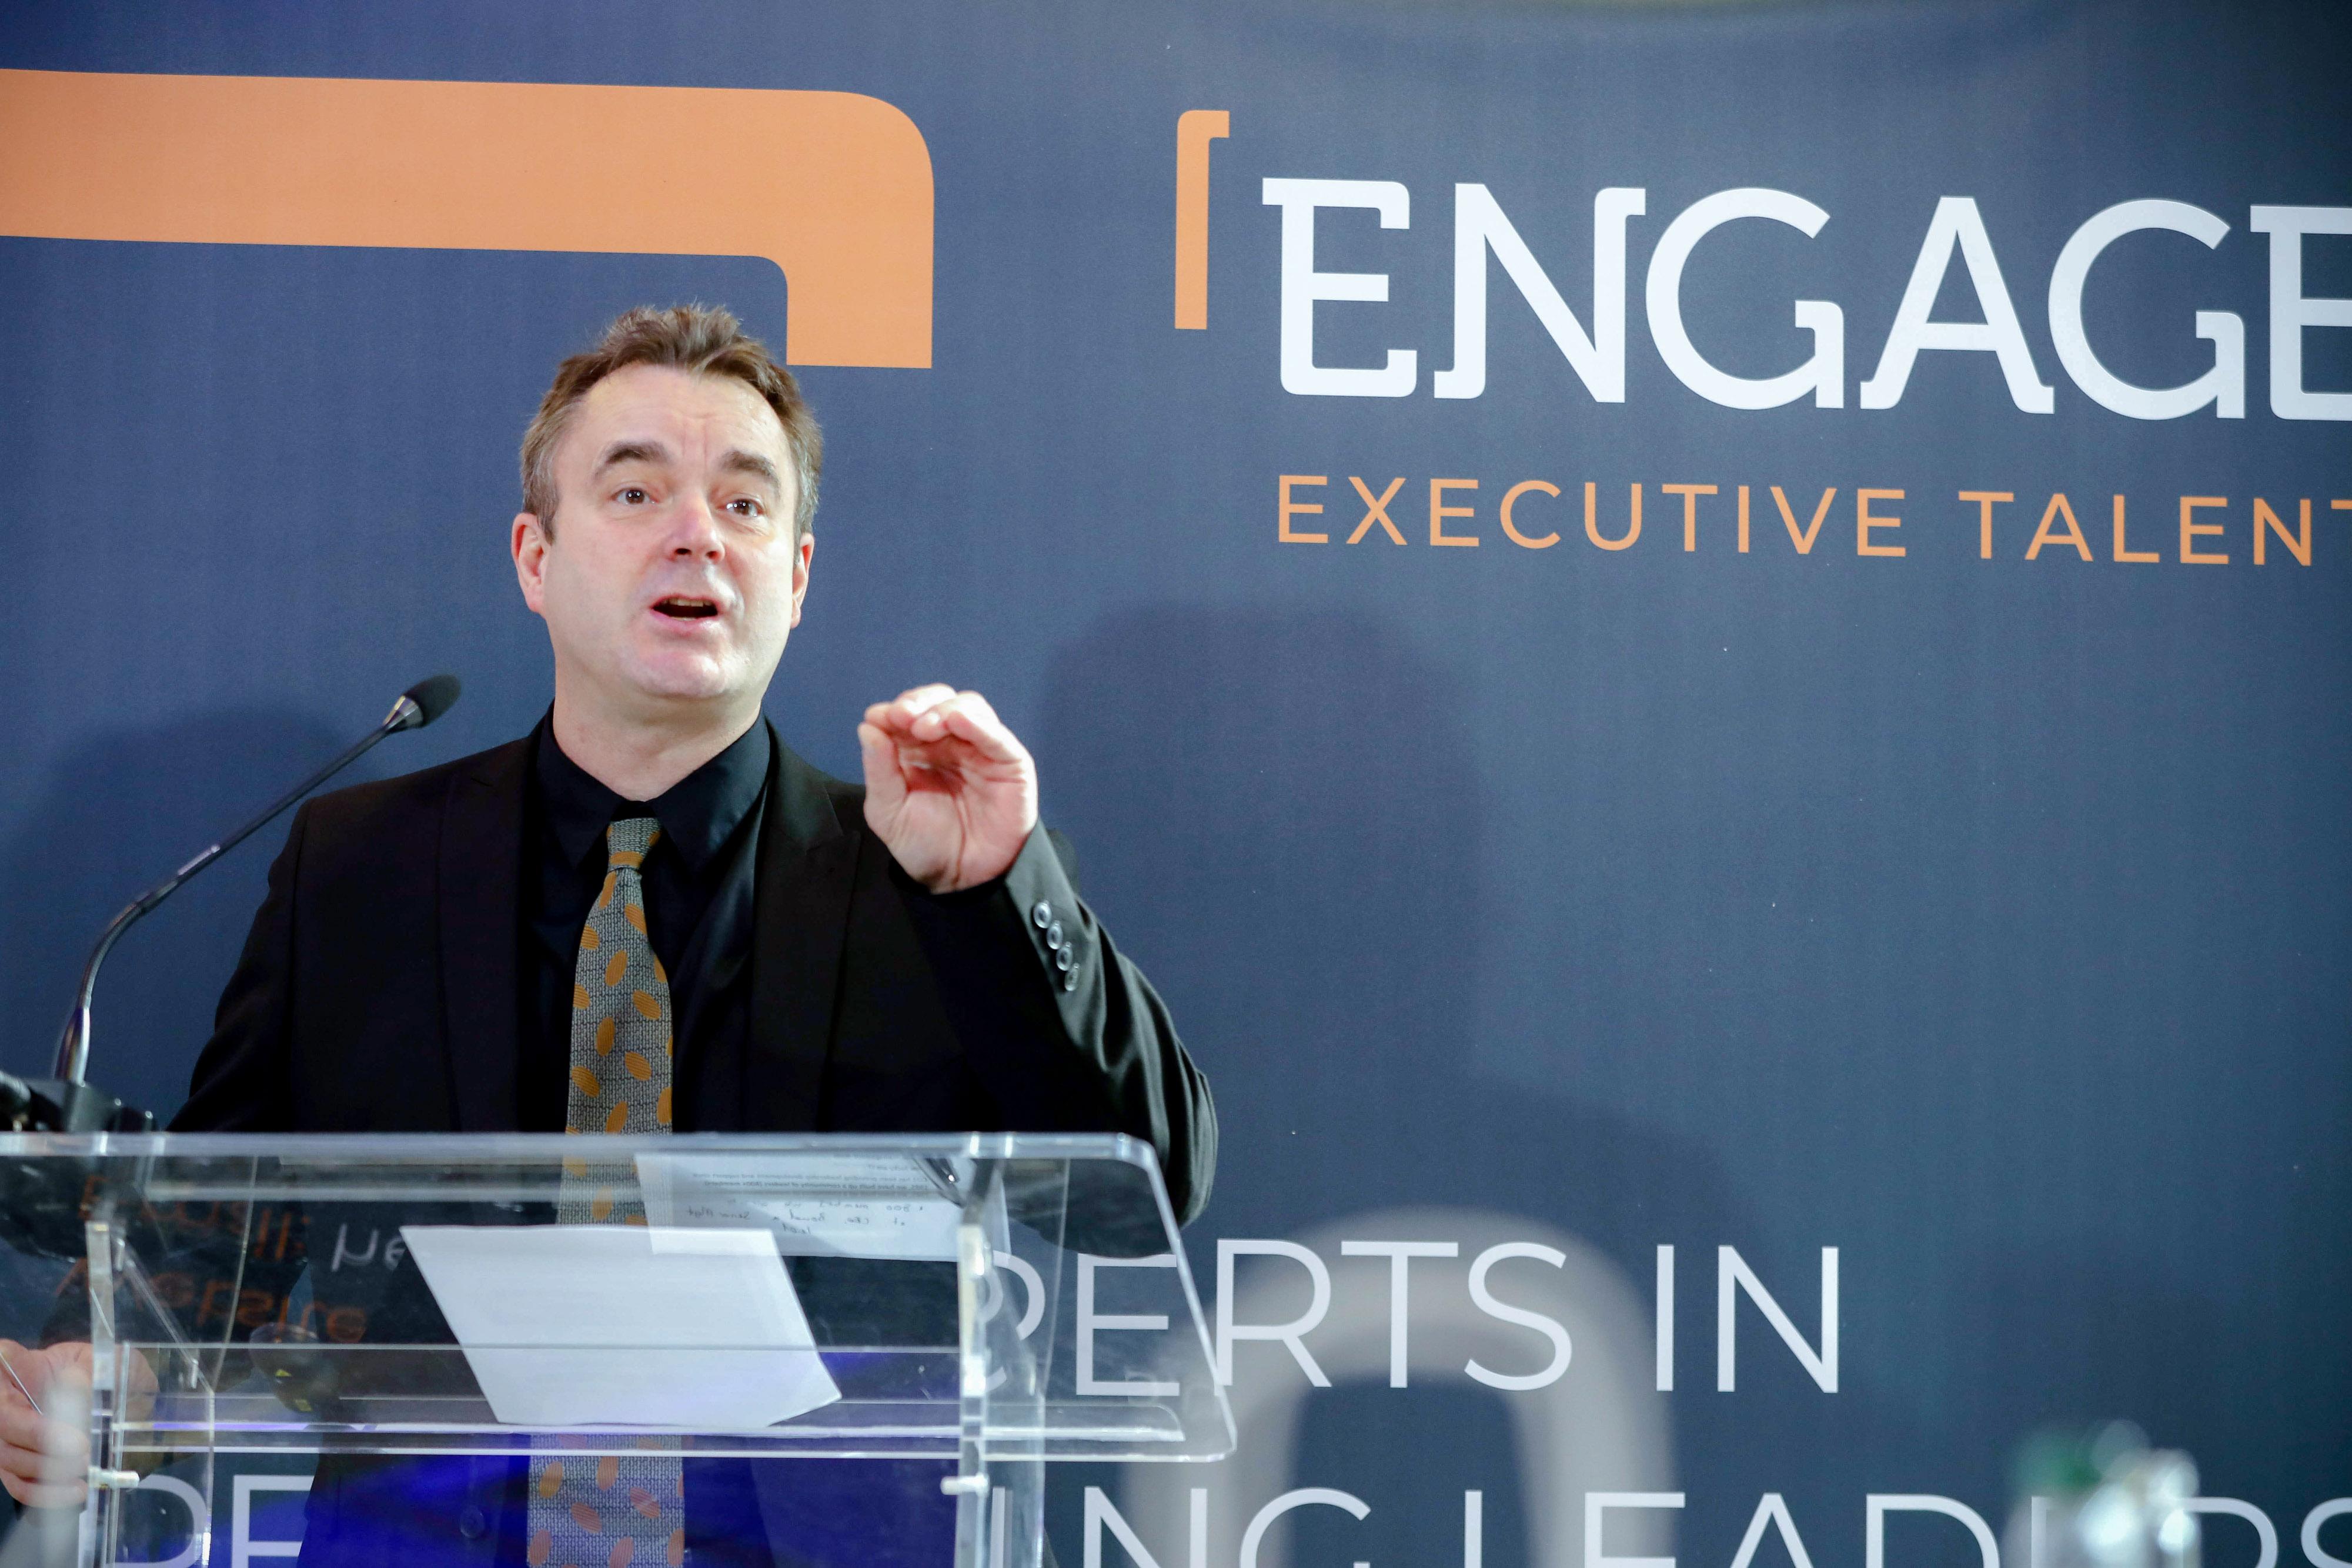 Patrick Minne addresses third sector leaders